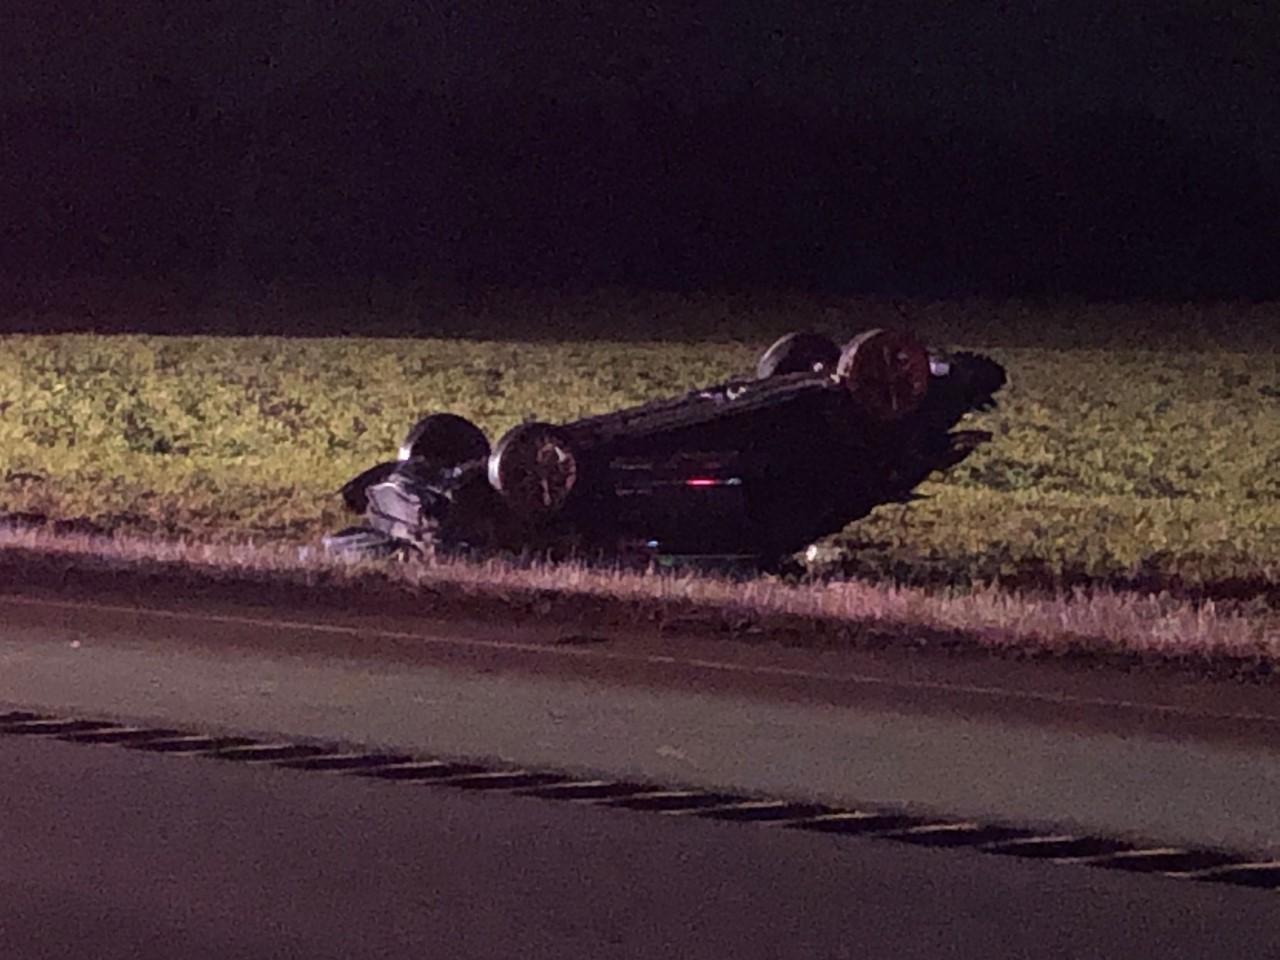 Alcohol a factor in Whitley County rollover crash